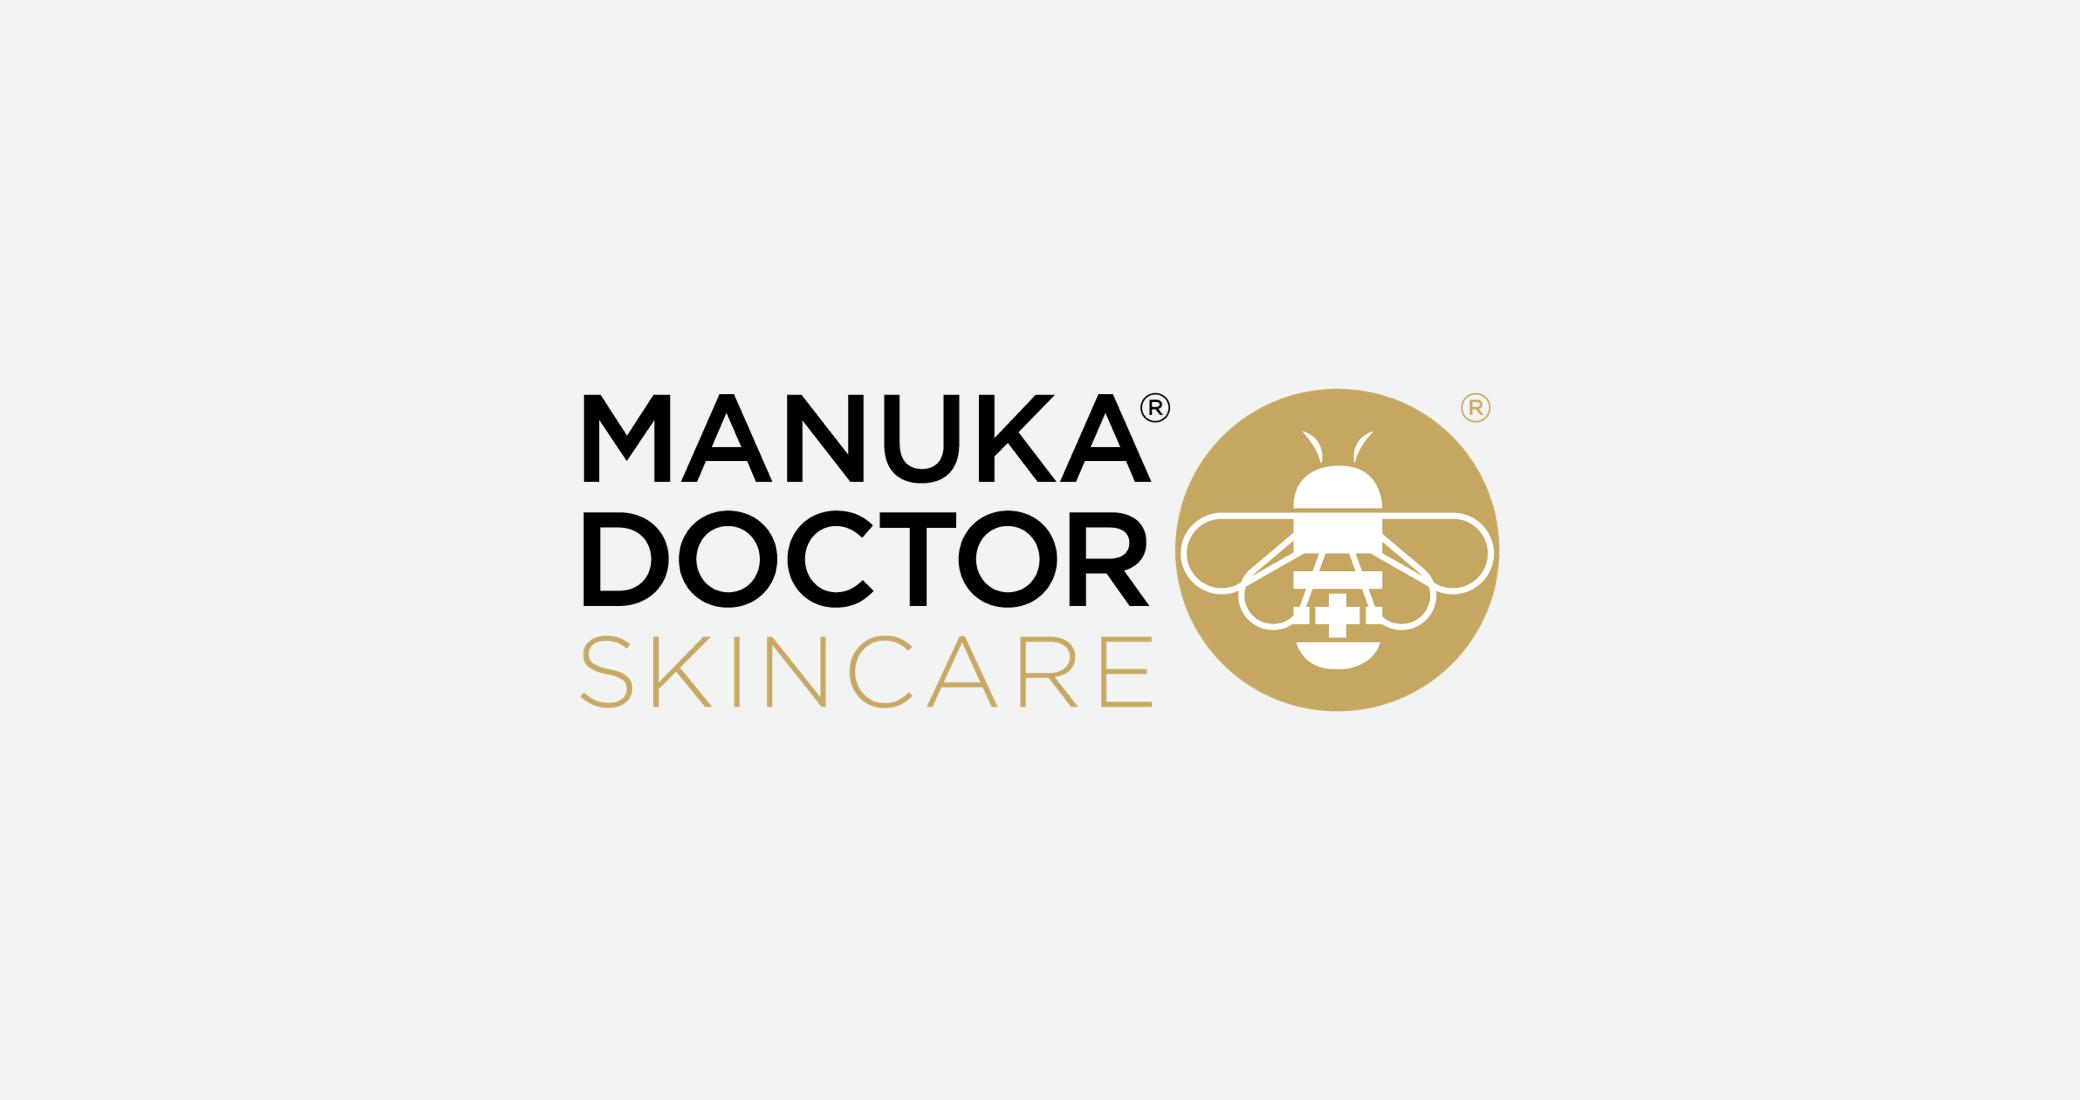 Manuka Doctor Skincare Logo